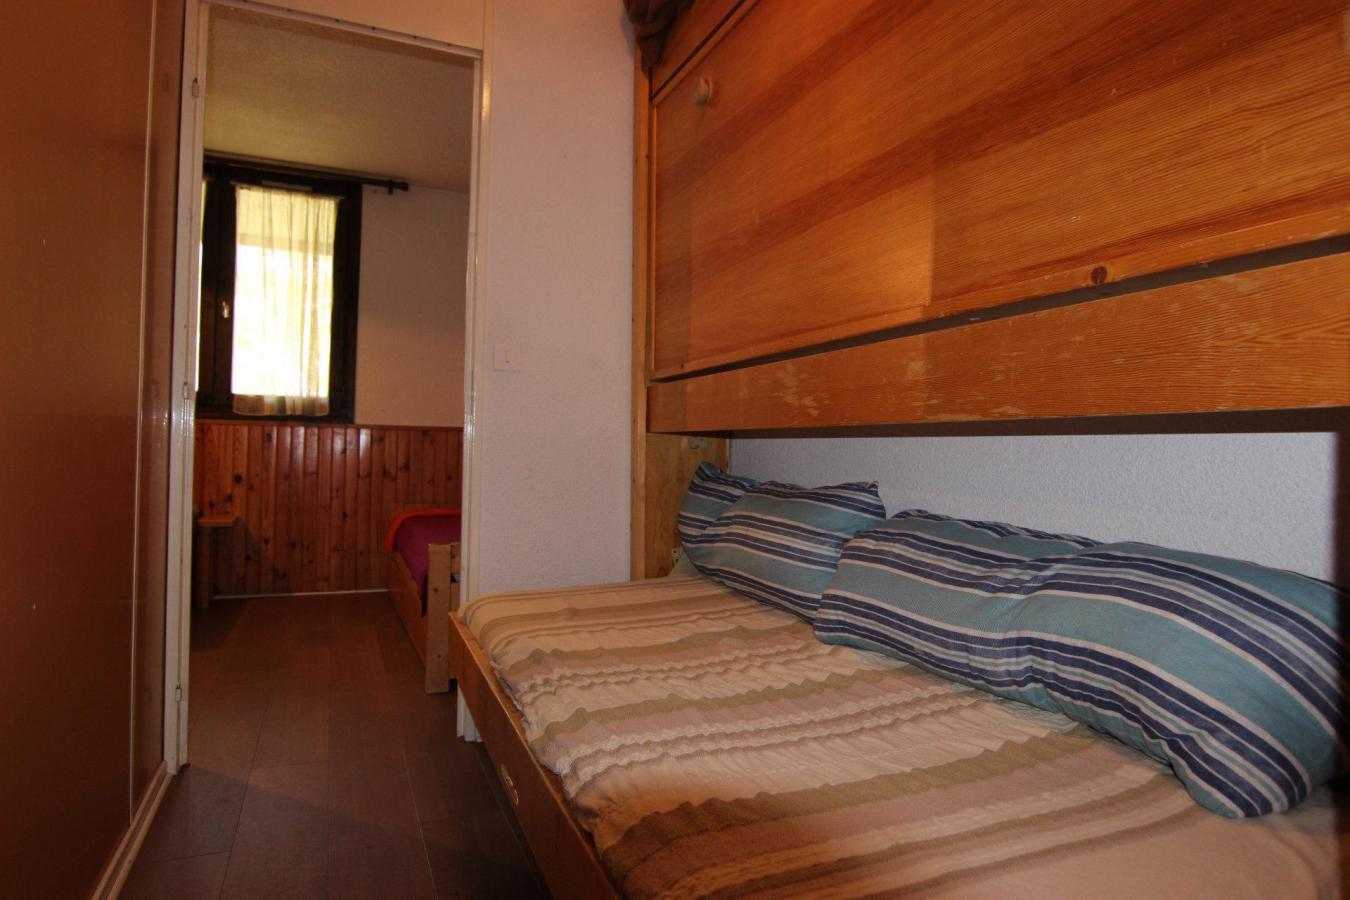 Location au ski Studio 2 personnes (145) - Residence Roche Blanche - Val Thorens - Canapé